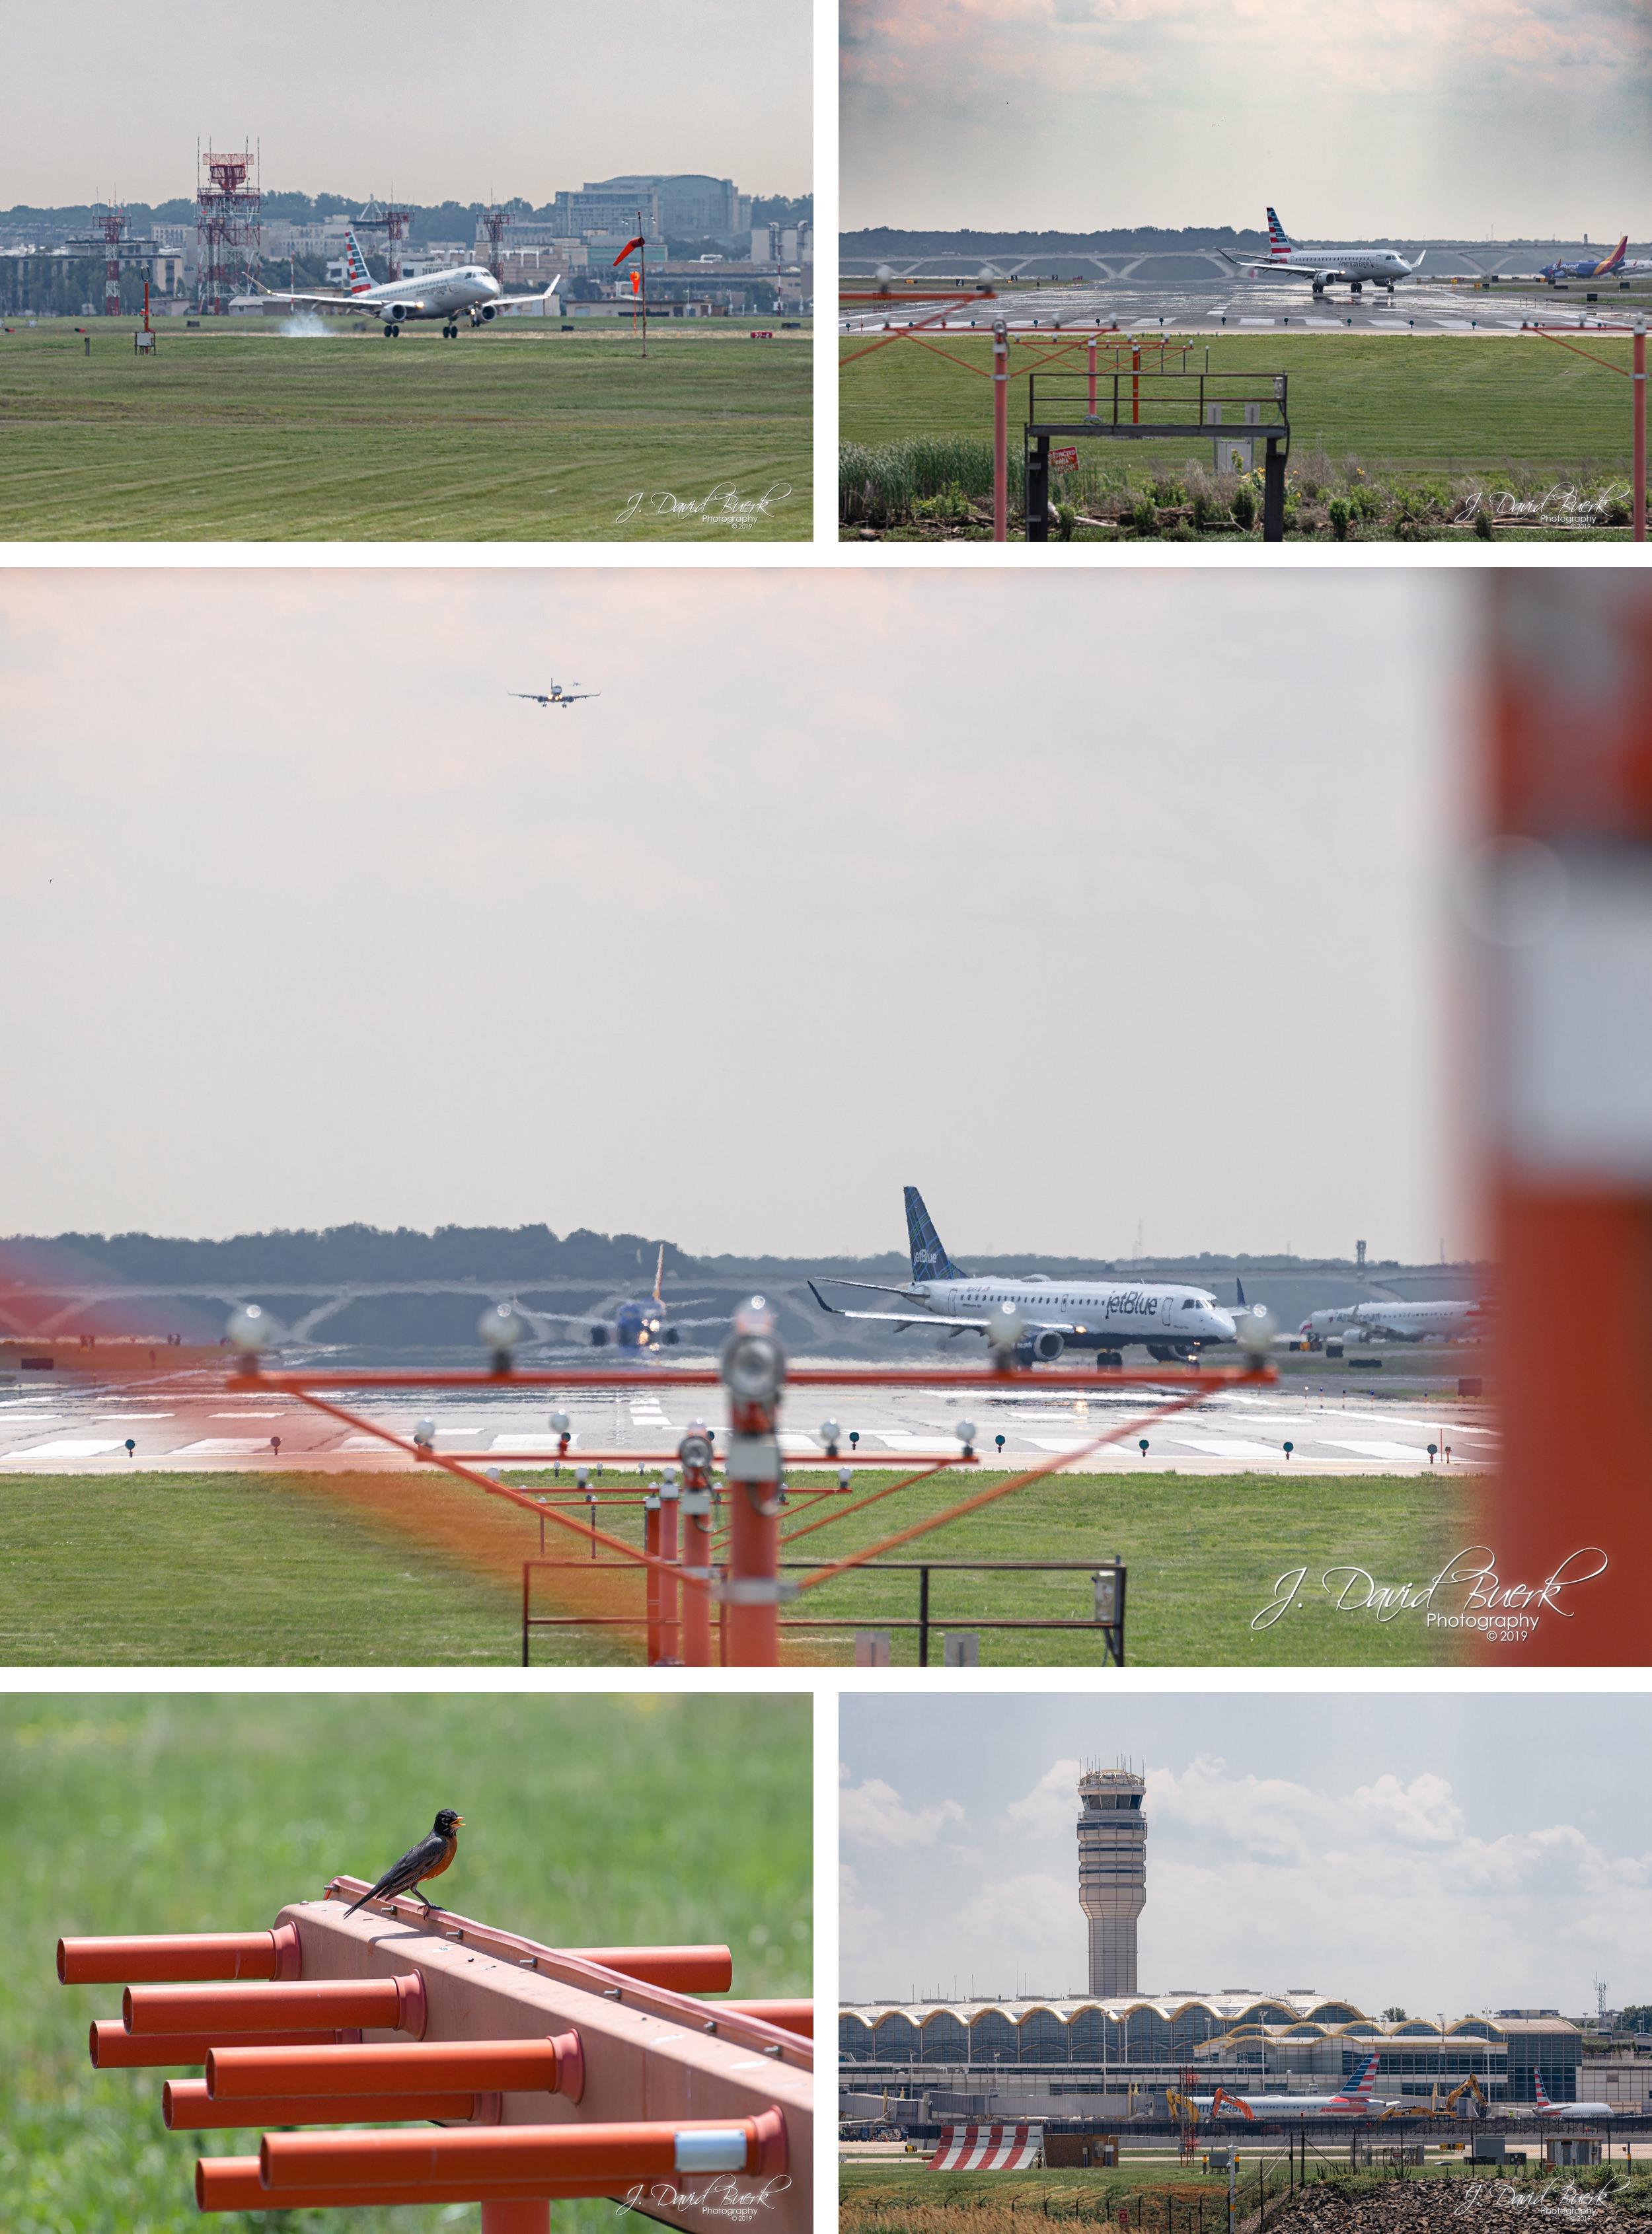 20190516 - DCA Planespotting 2.jpg